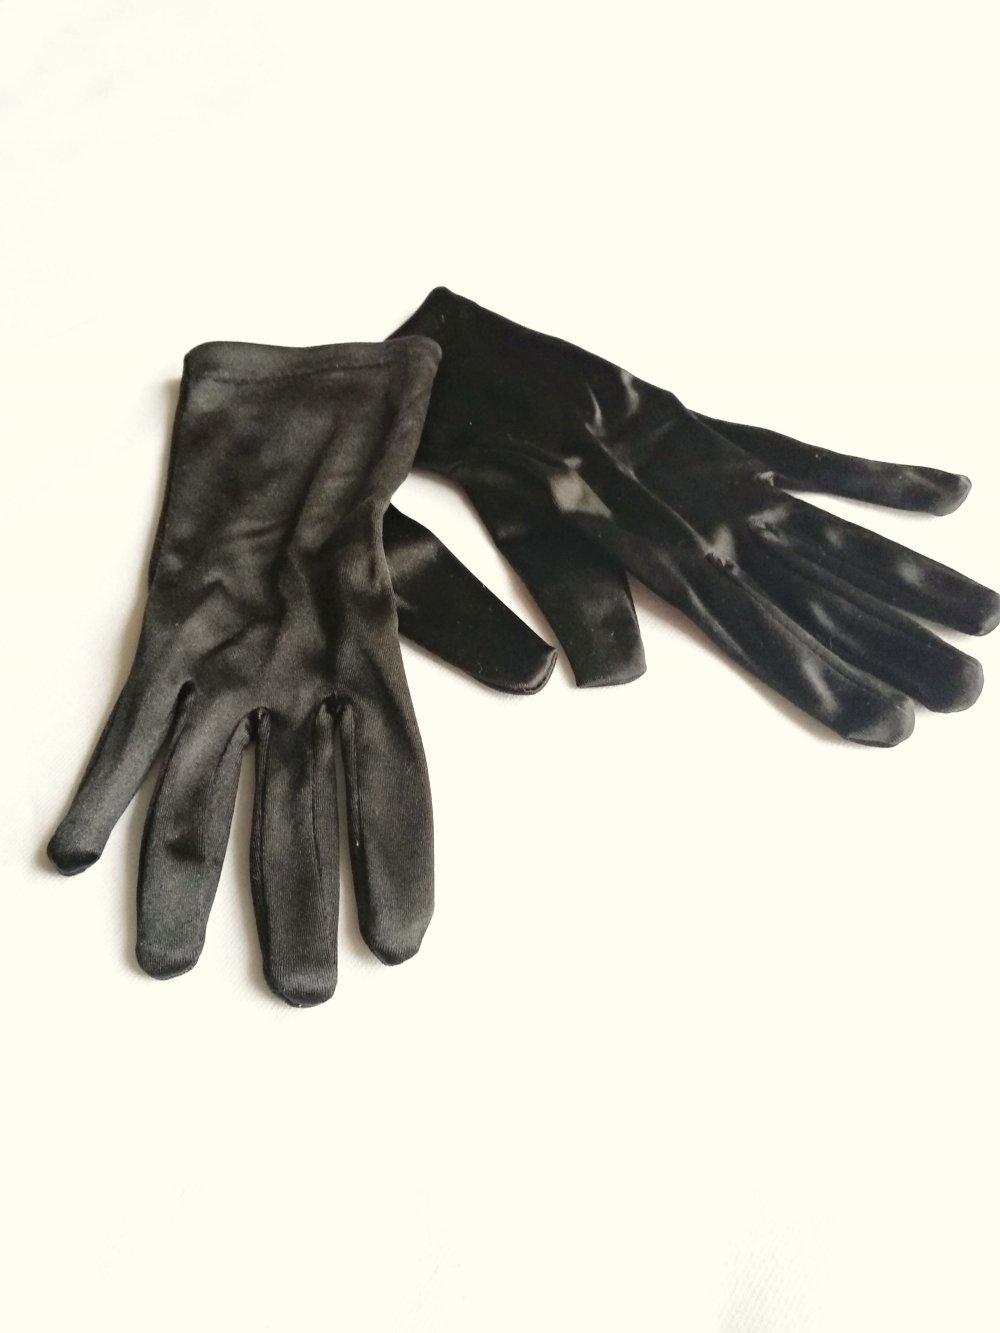 4516fa2b87189c ... Glänzende schwarze Satin Handschuhe Pantomime Karneval Fasching  Tanzmariechen .